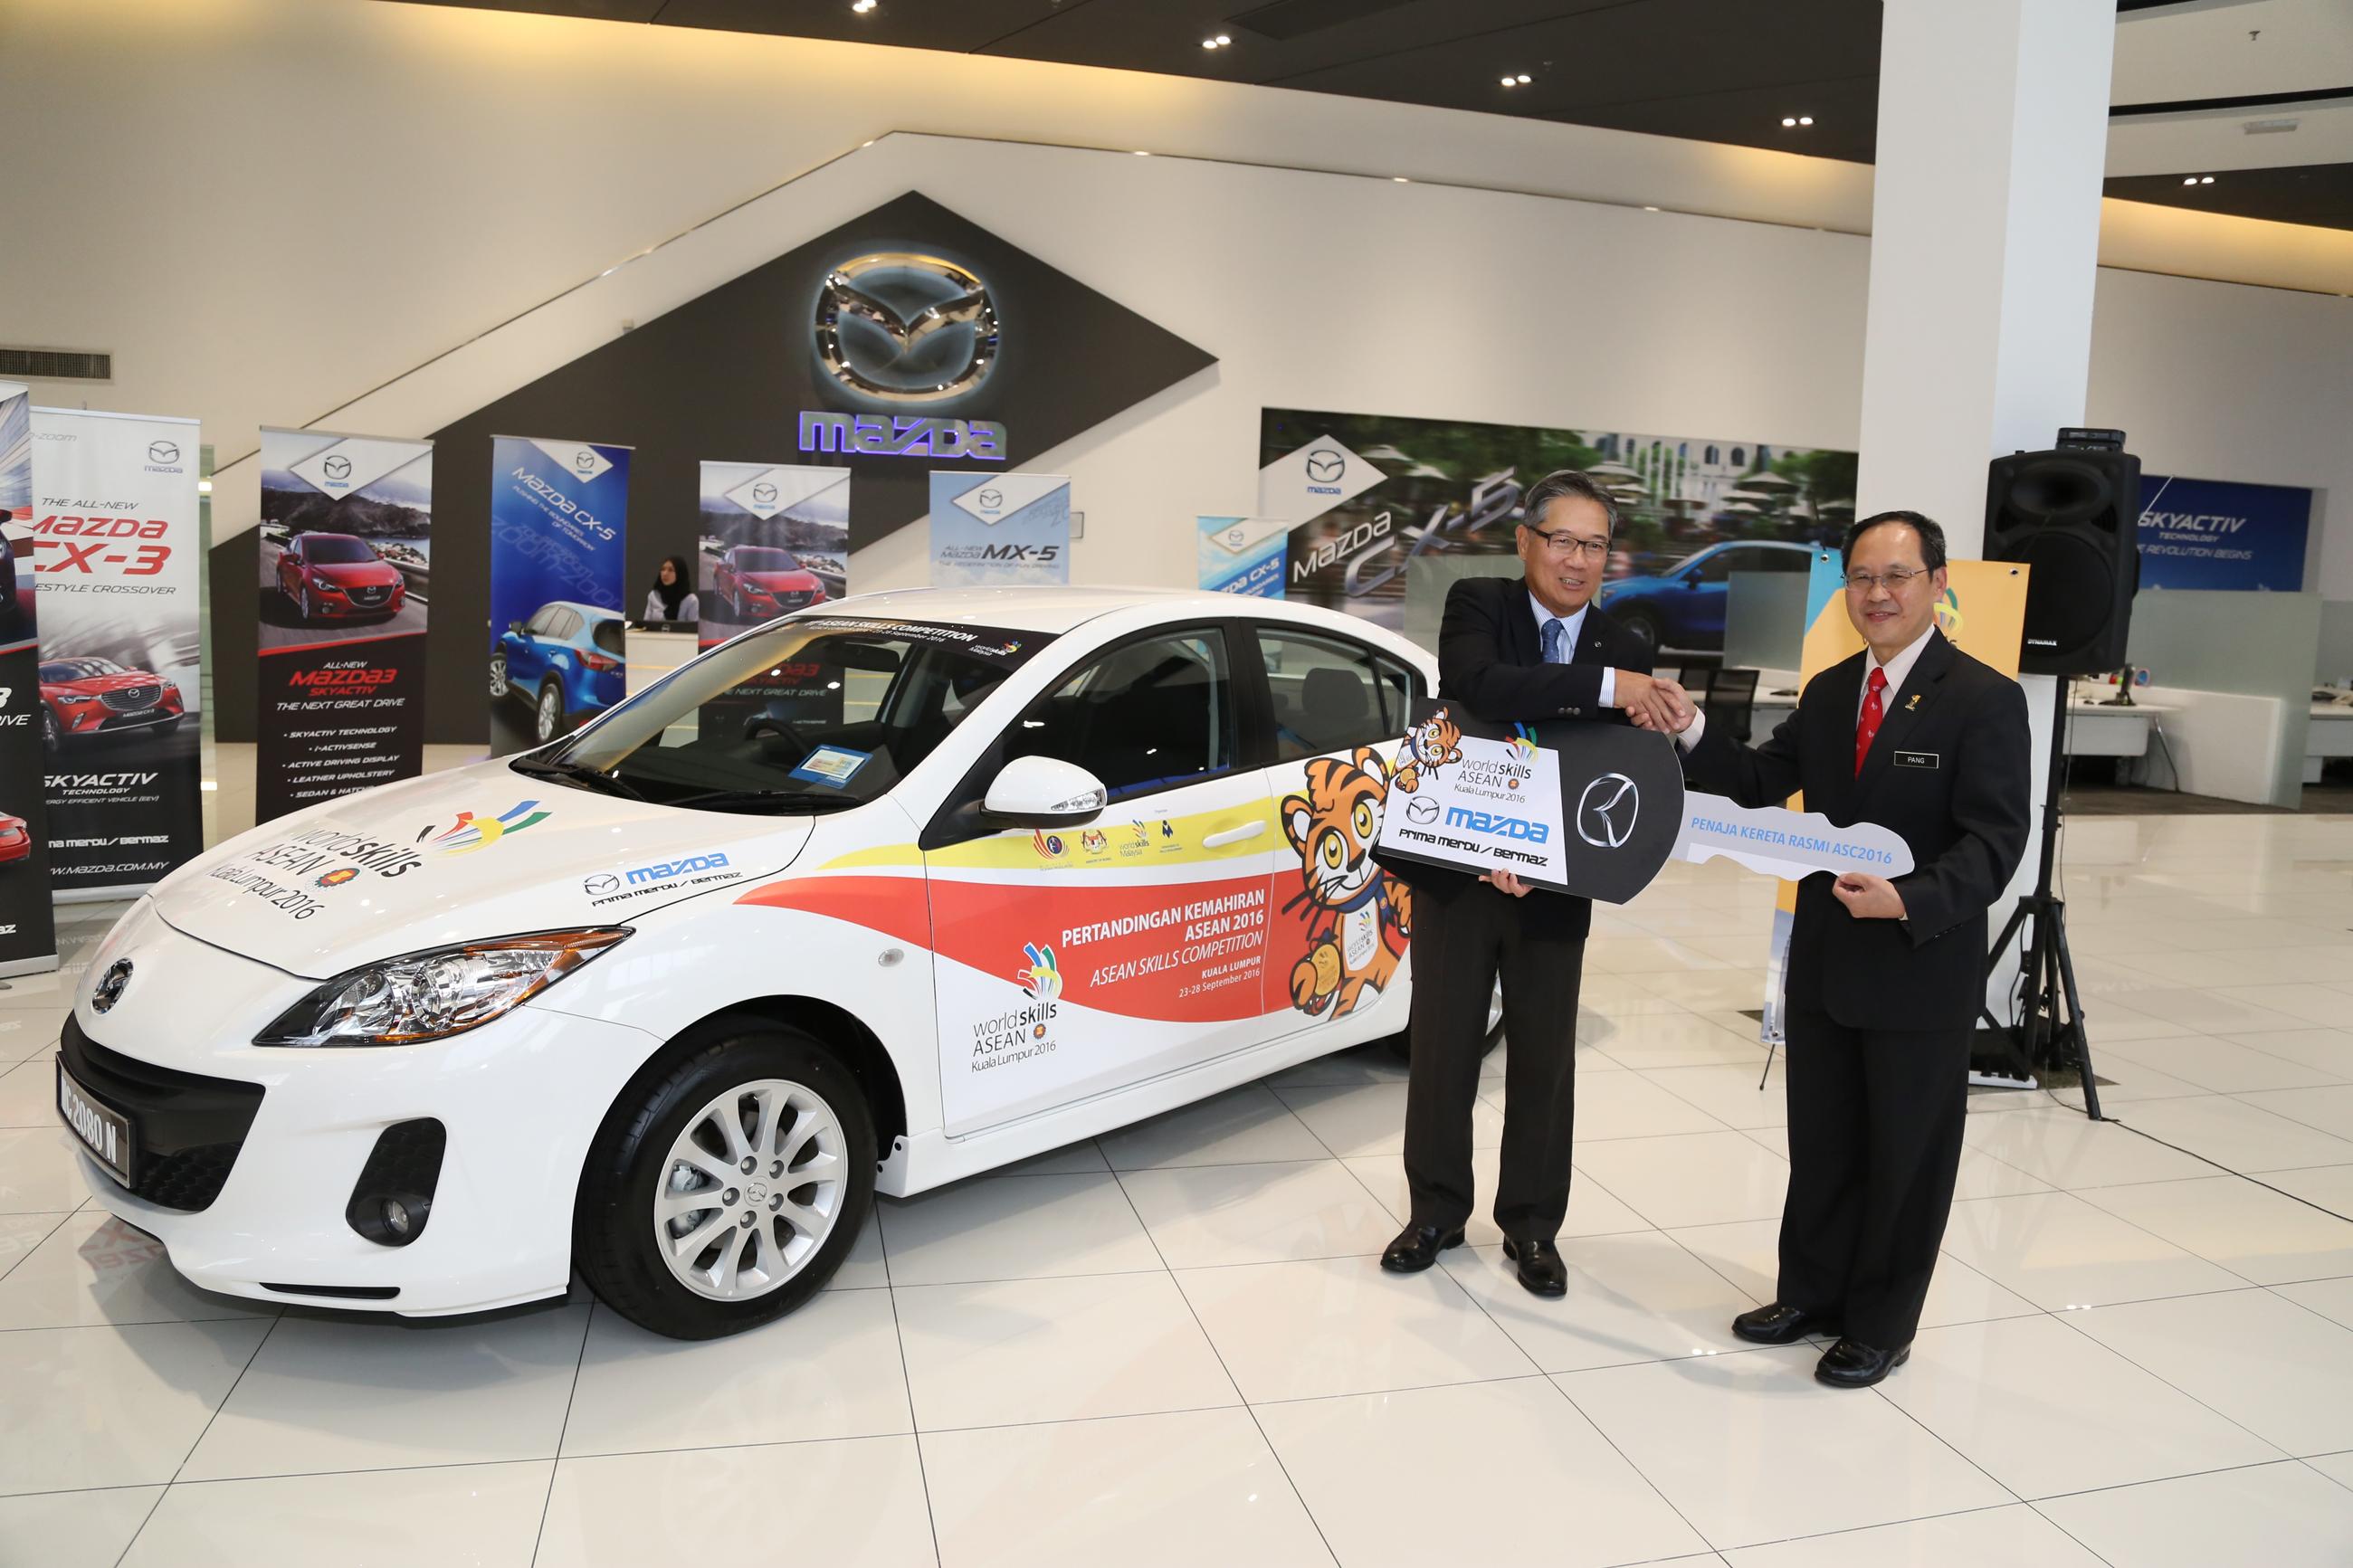 Bermaz Motor managing director Datuk Seri Ben Yeoh handing over a mock Mazda3 car key to Human Resources Ministry Training Development director-general Datuk Dr Pang Chau